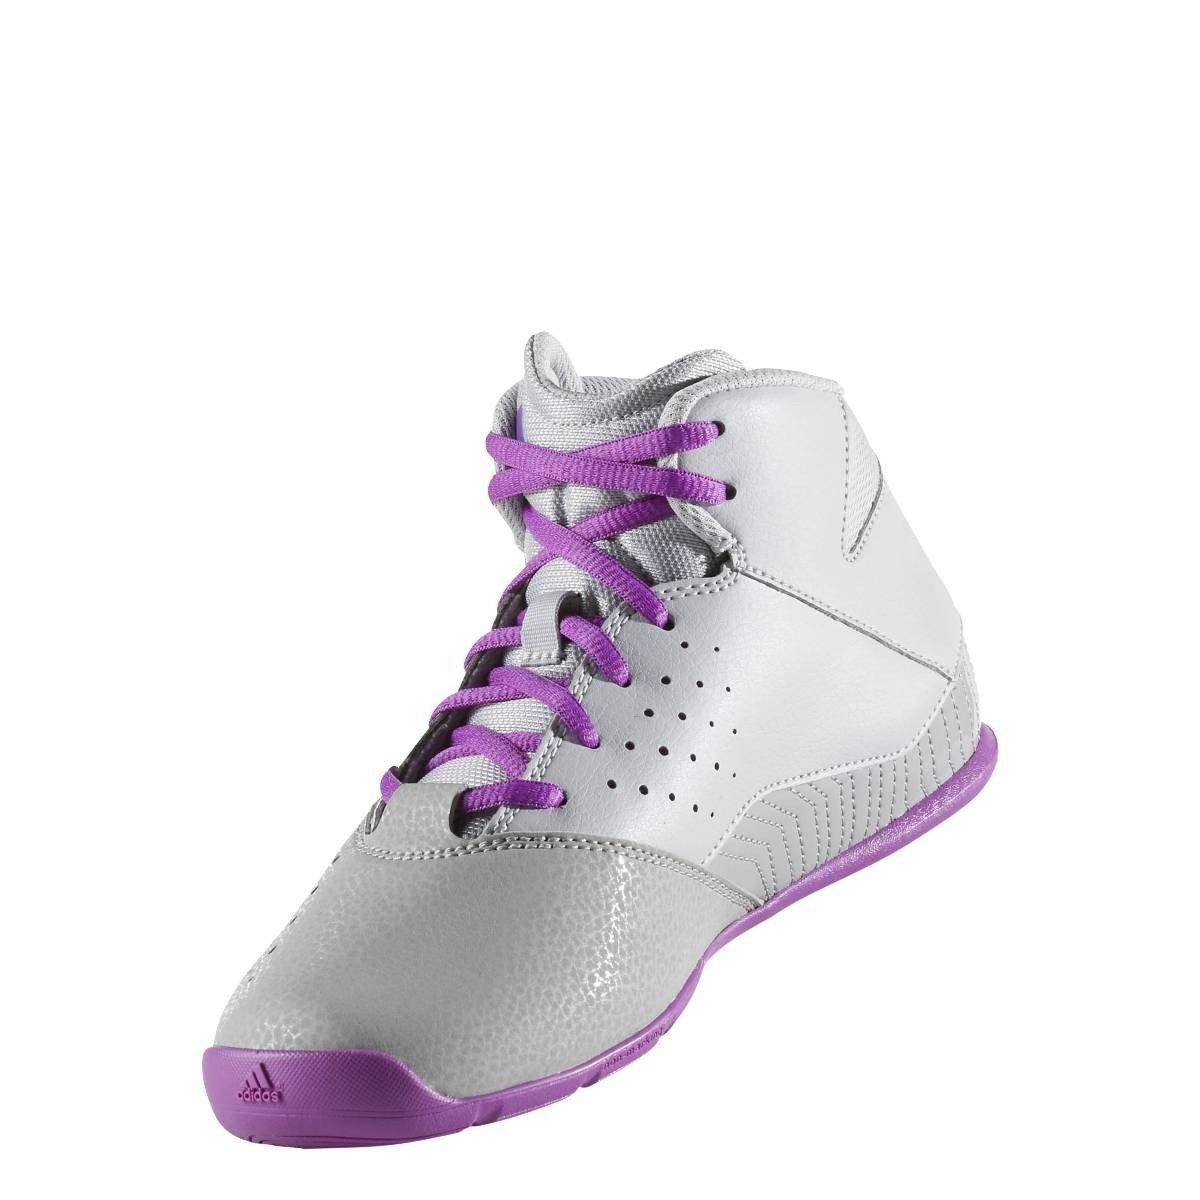 Adidas Nxt Lvl SPD V K, Chaussures de Basketball Mixte Enfant BB8284